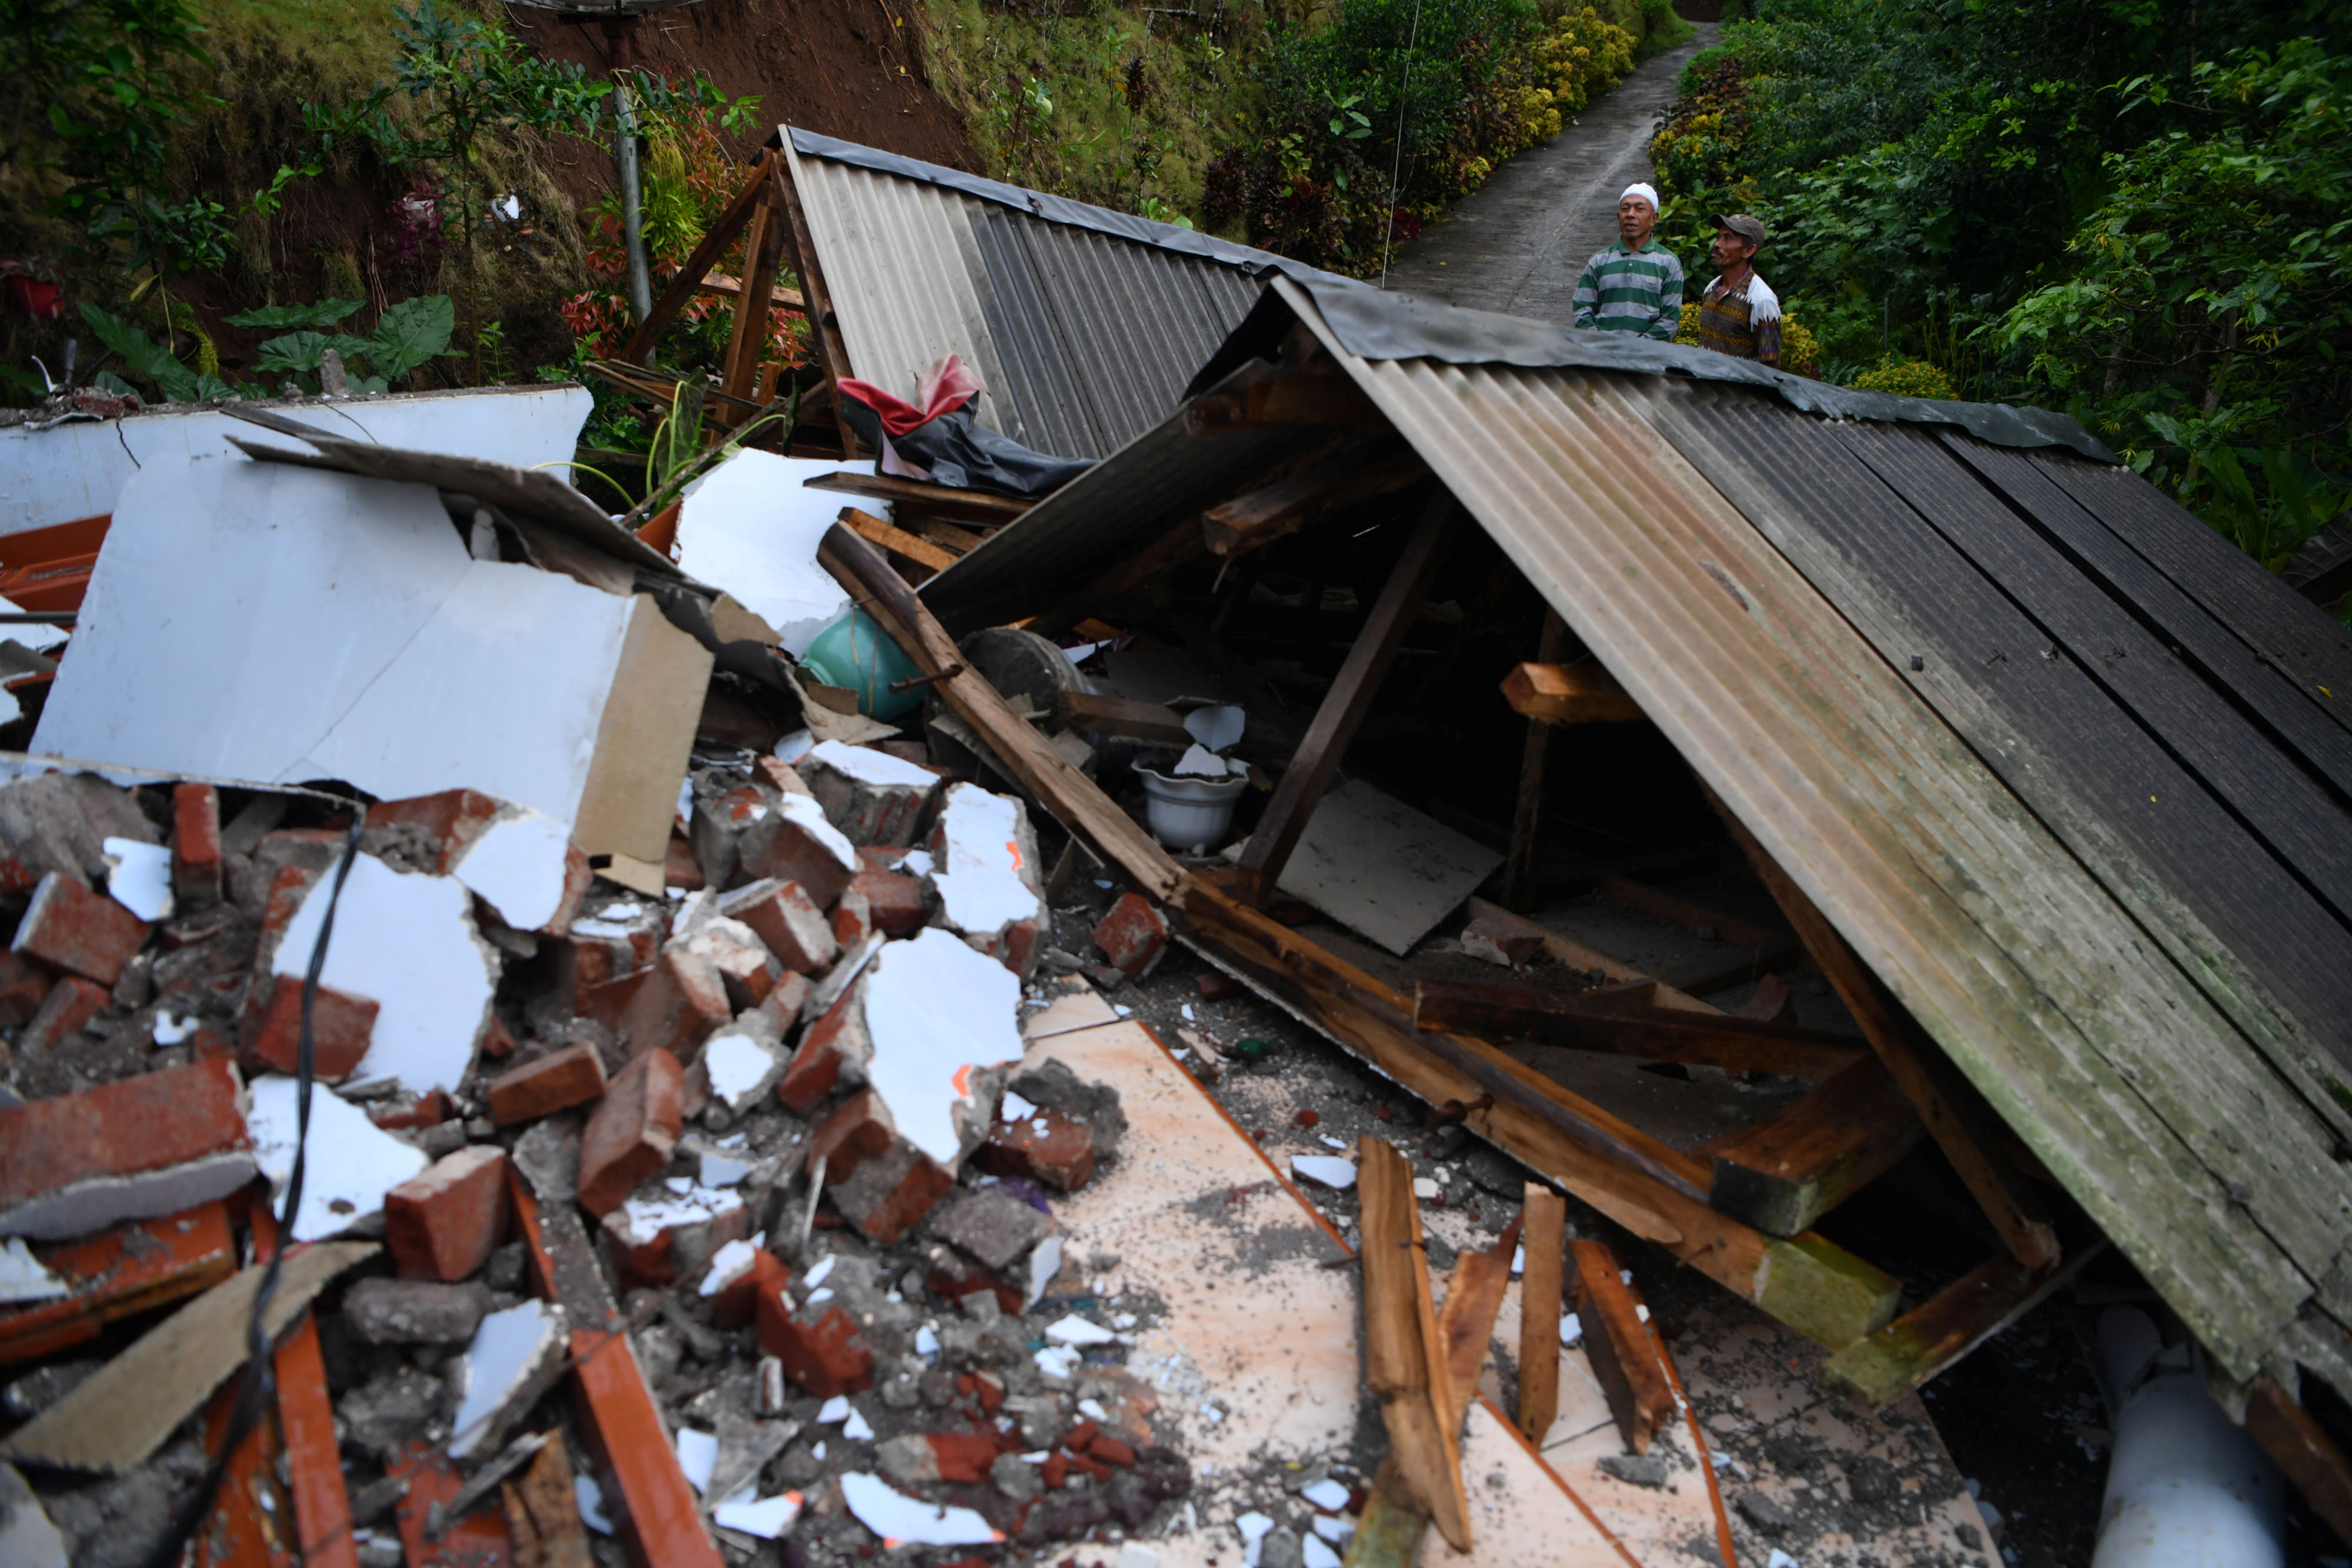 Men stand near a damaged house affected by an earthquake in Lumajang, East Java province, Indonesia April 11, 2021, in this photo taken by Antara Foto. Antara Foto/Zabur Karuru/via Reuters